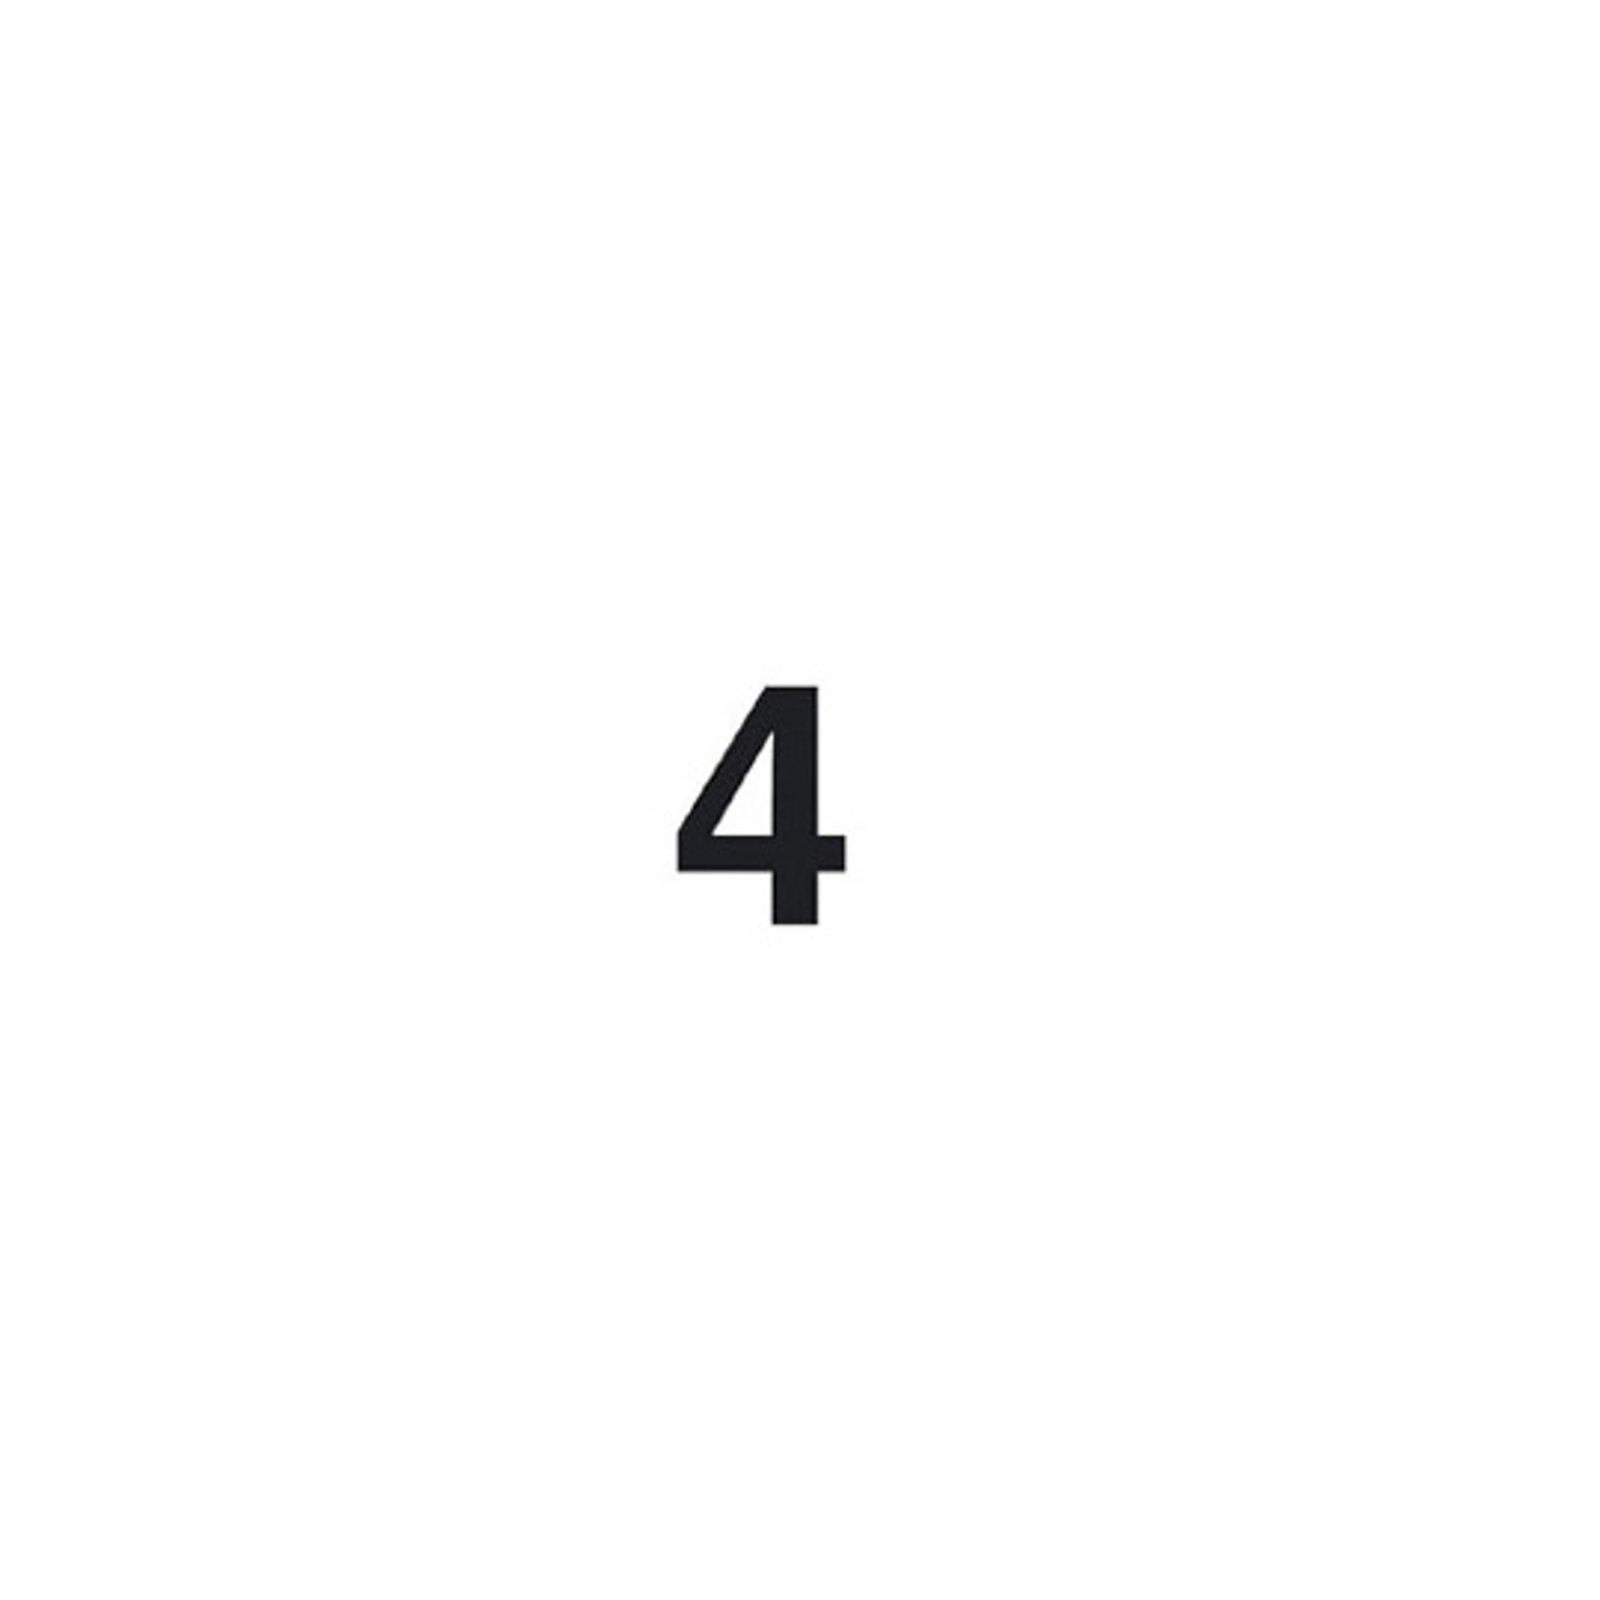 Selvklebende tallet 4